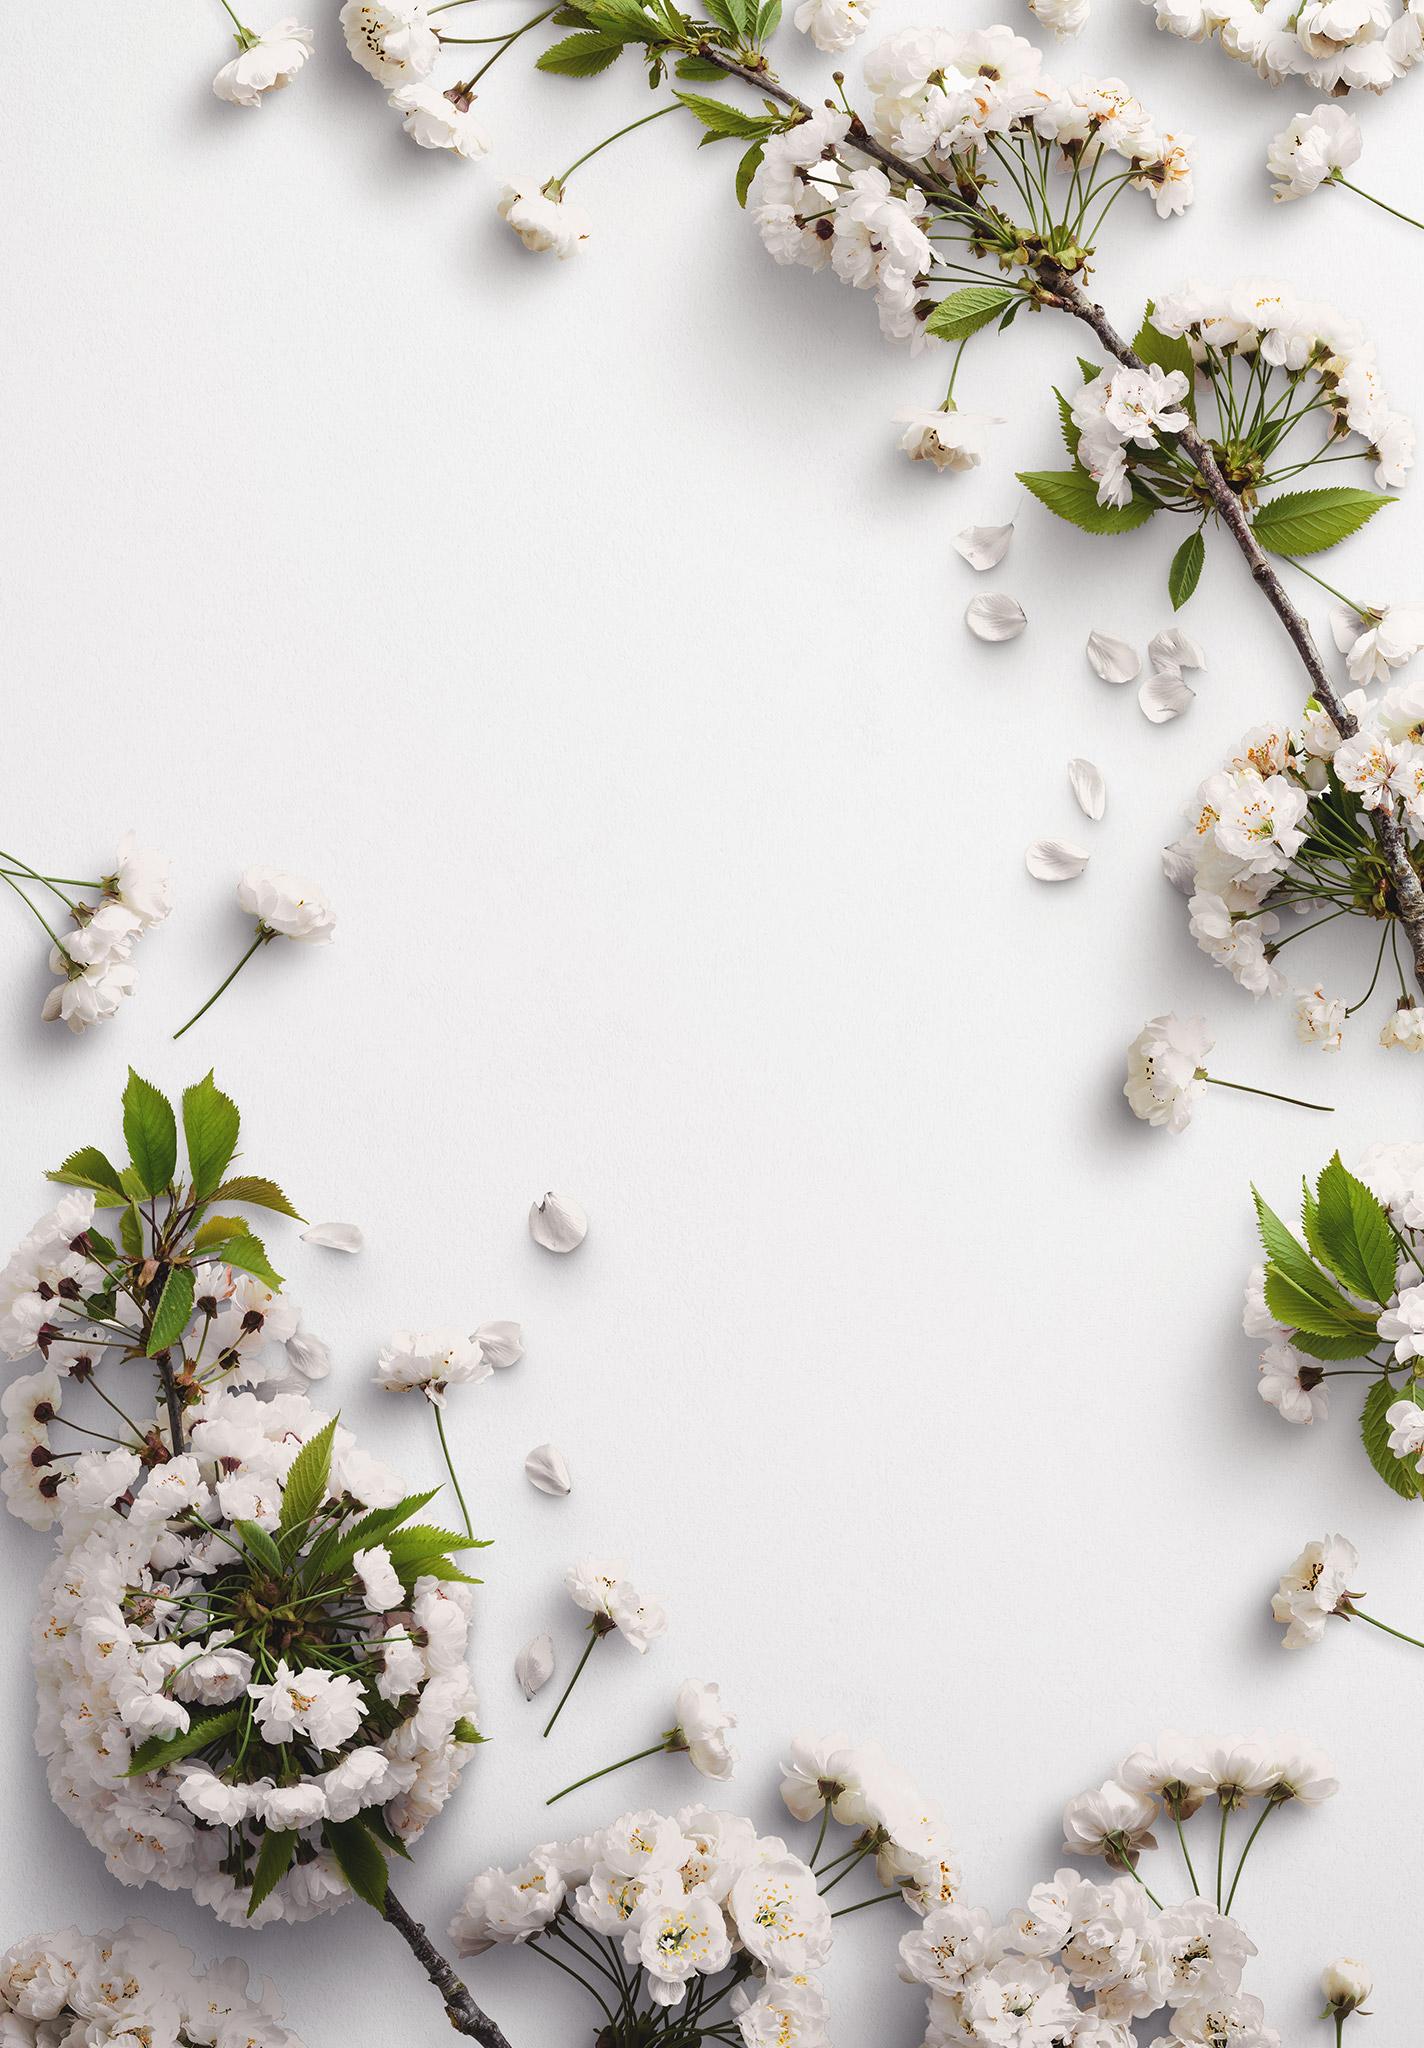 Cherry Blossoms Custom Scene Creator Template 6 Thumbnail